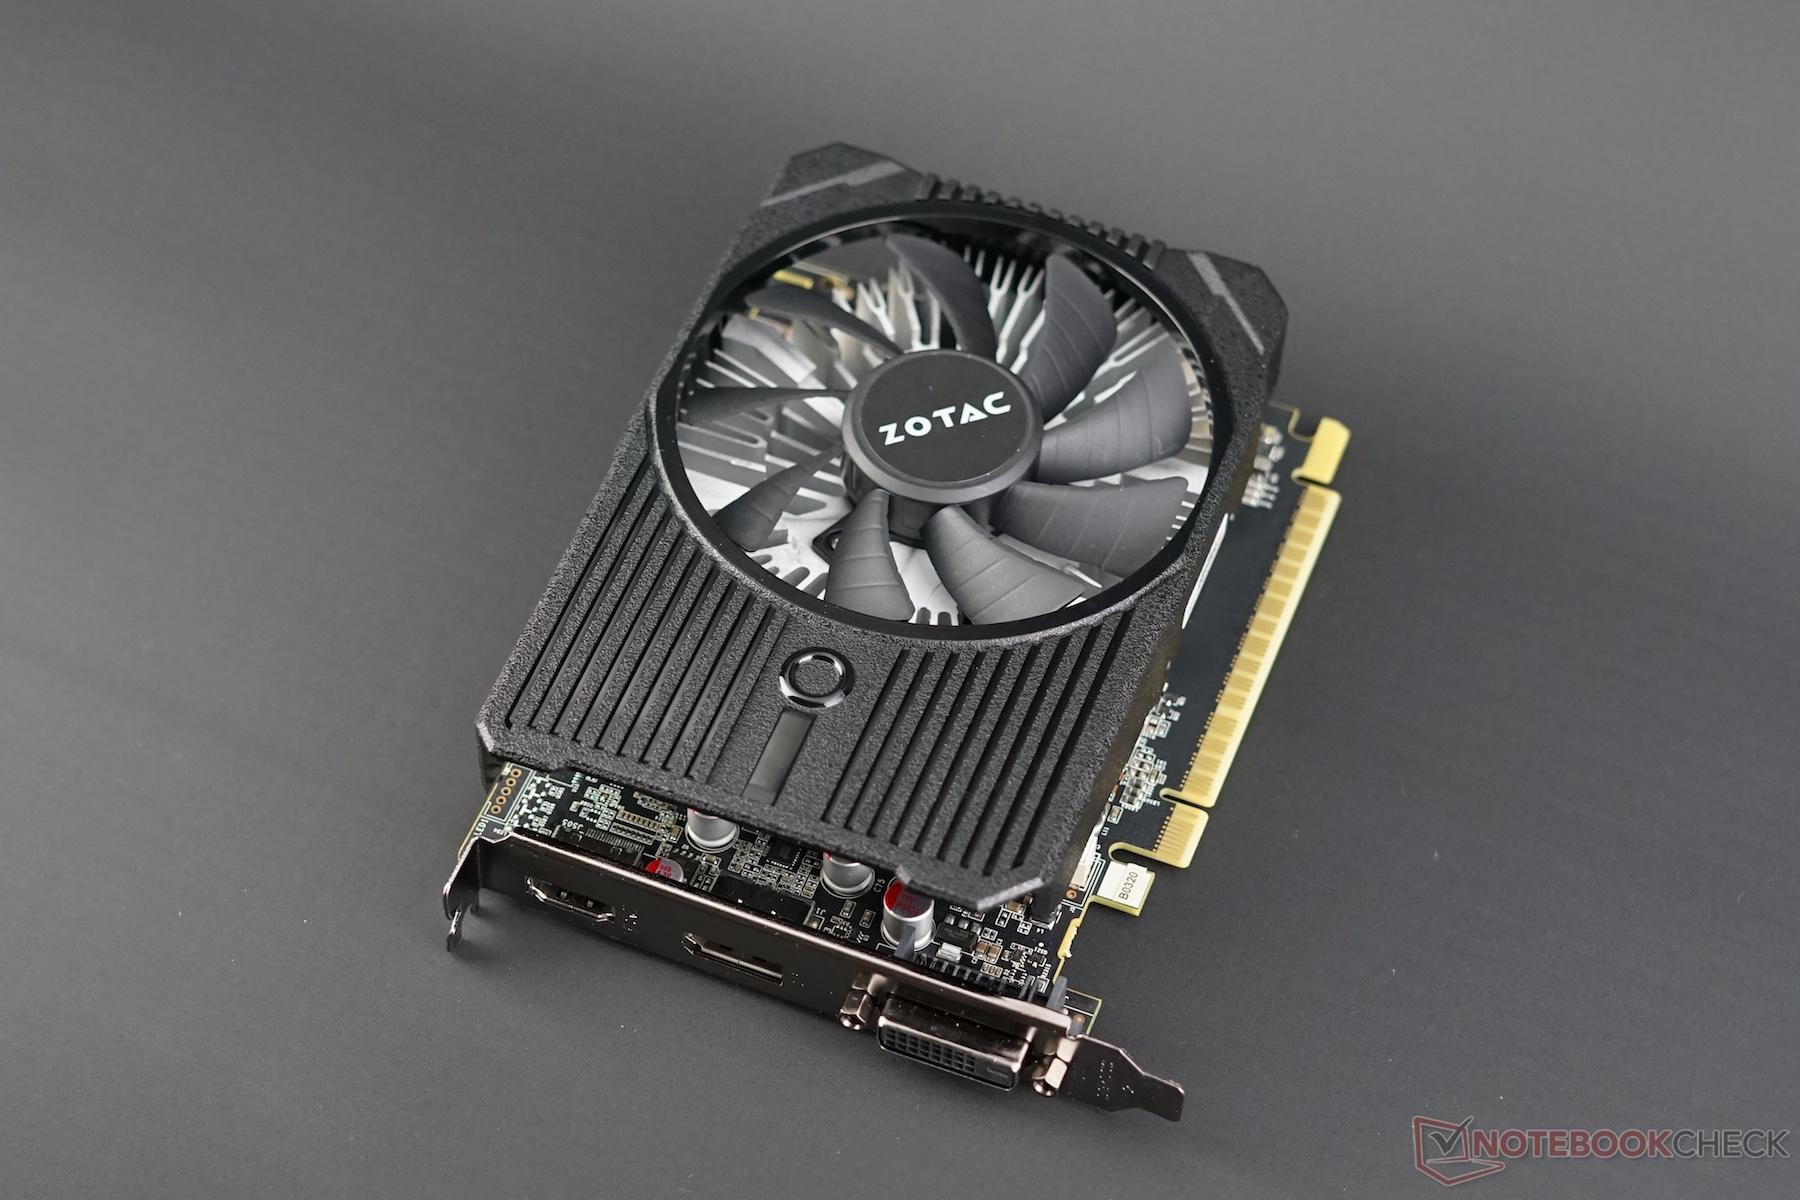 Zotac Geforce Gtx 1050 Mini 2gb Review Reviews Inno 3d 1050ti 4gb Ddr5 Compact Full Resolution